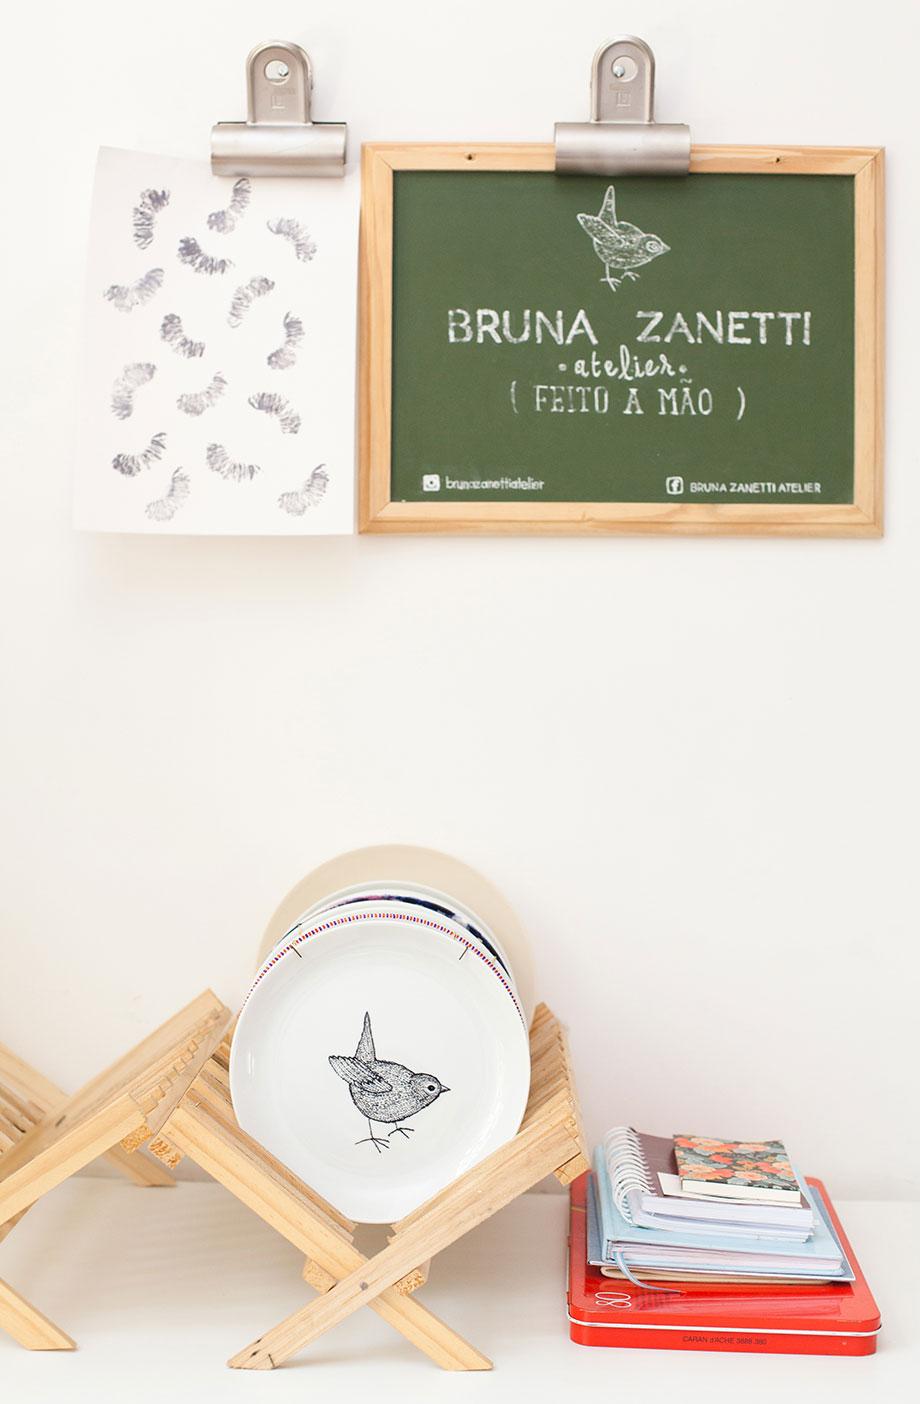 brunazanettiatelier_porcelana_talitachaves13